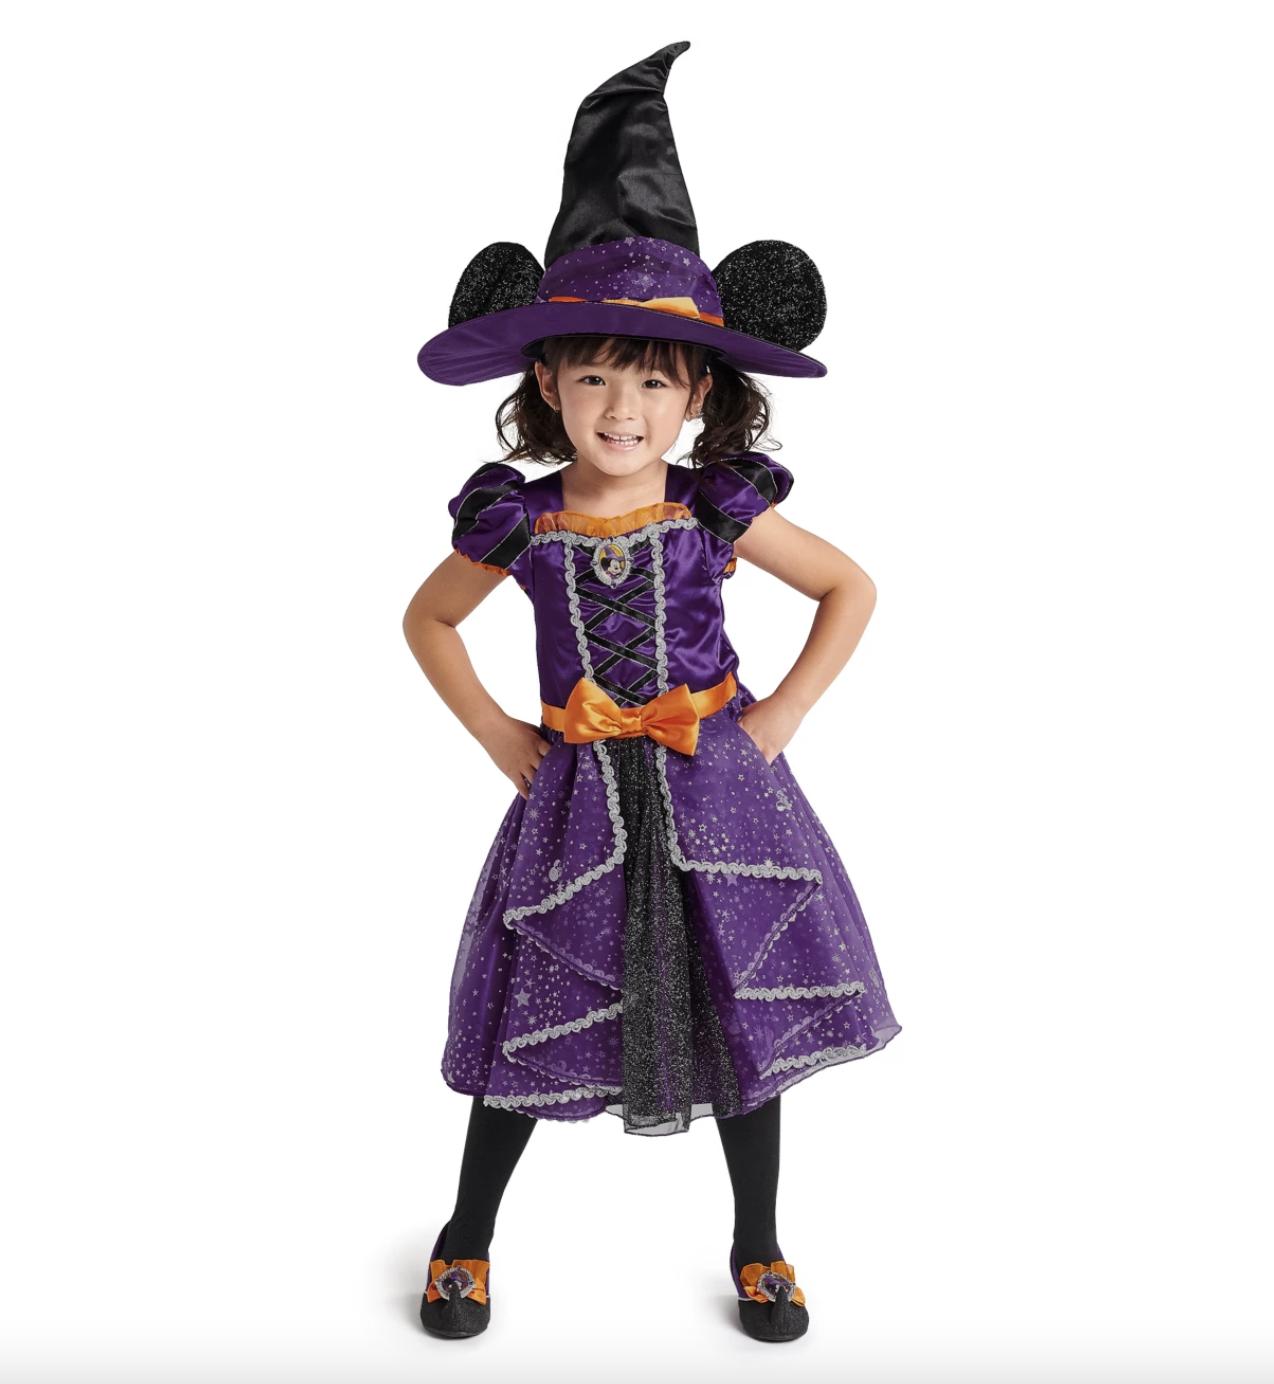 Disney Store: 30% off Halloween Costumes